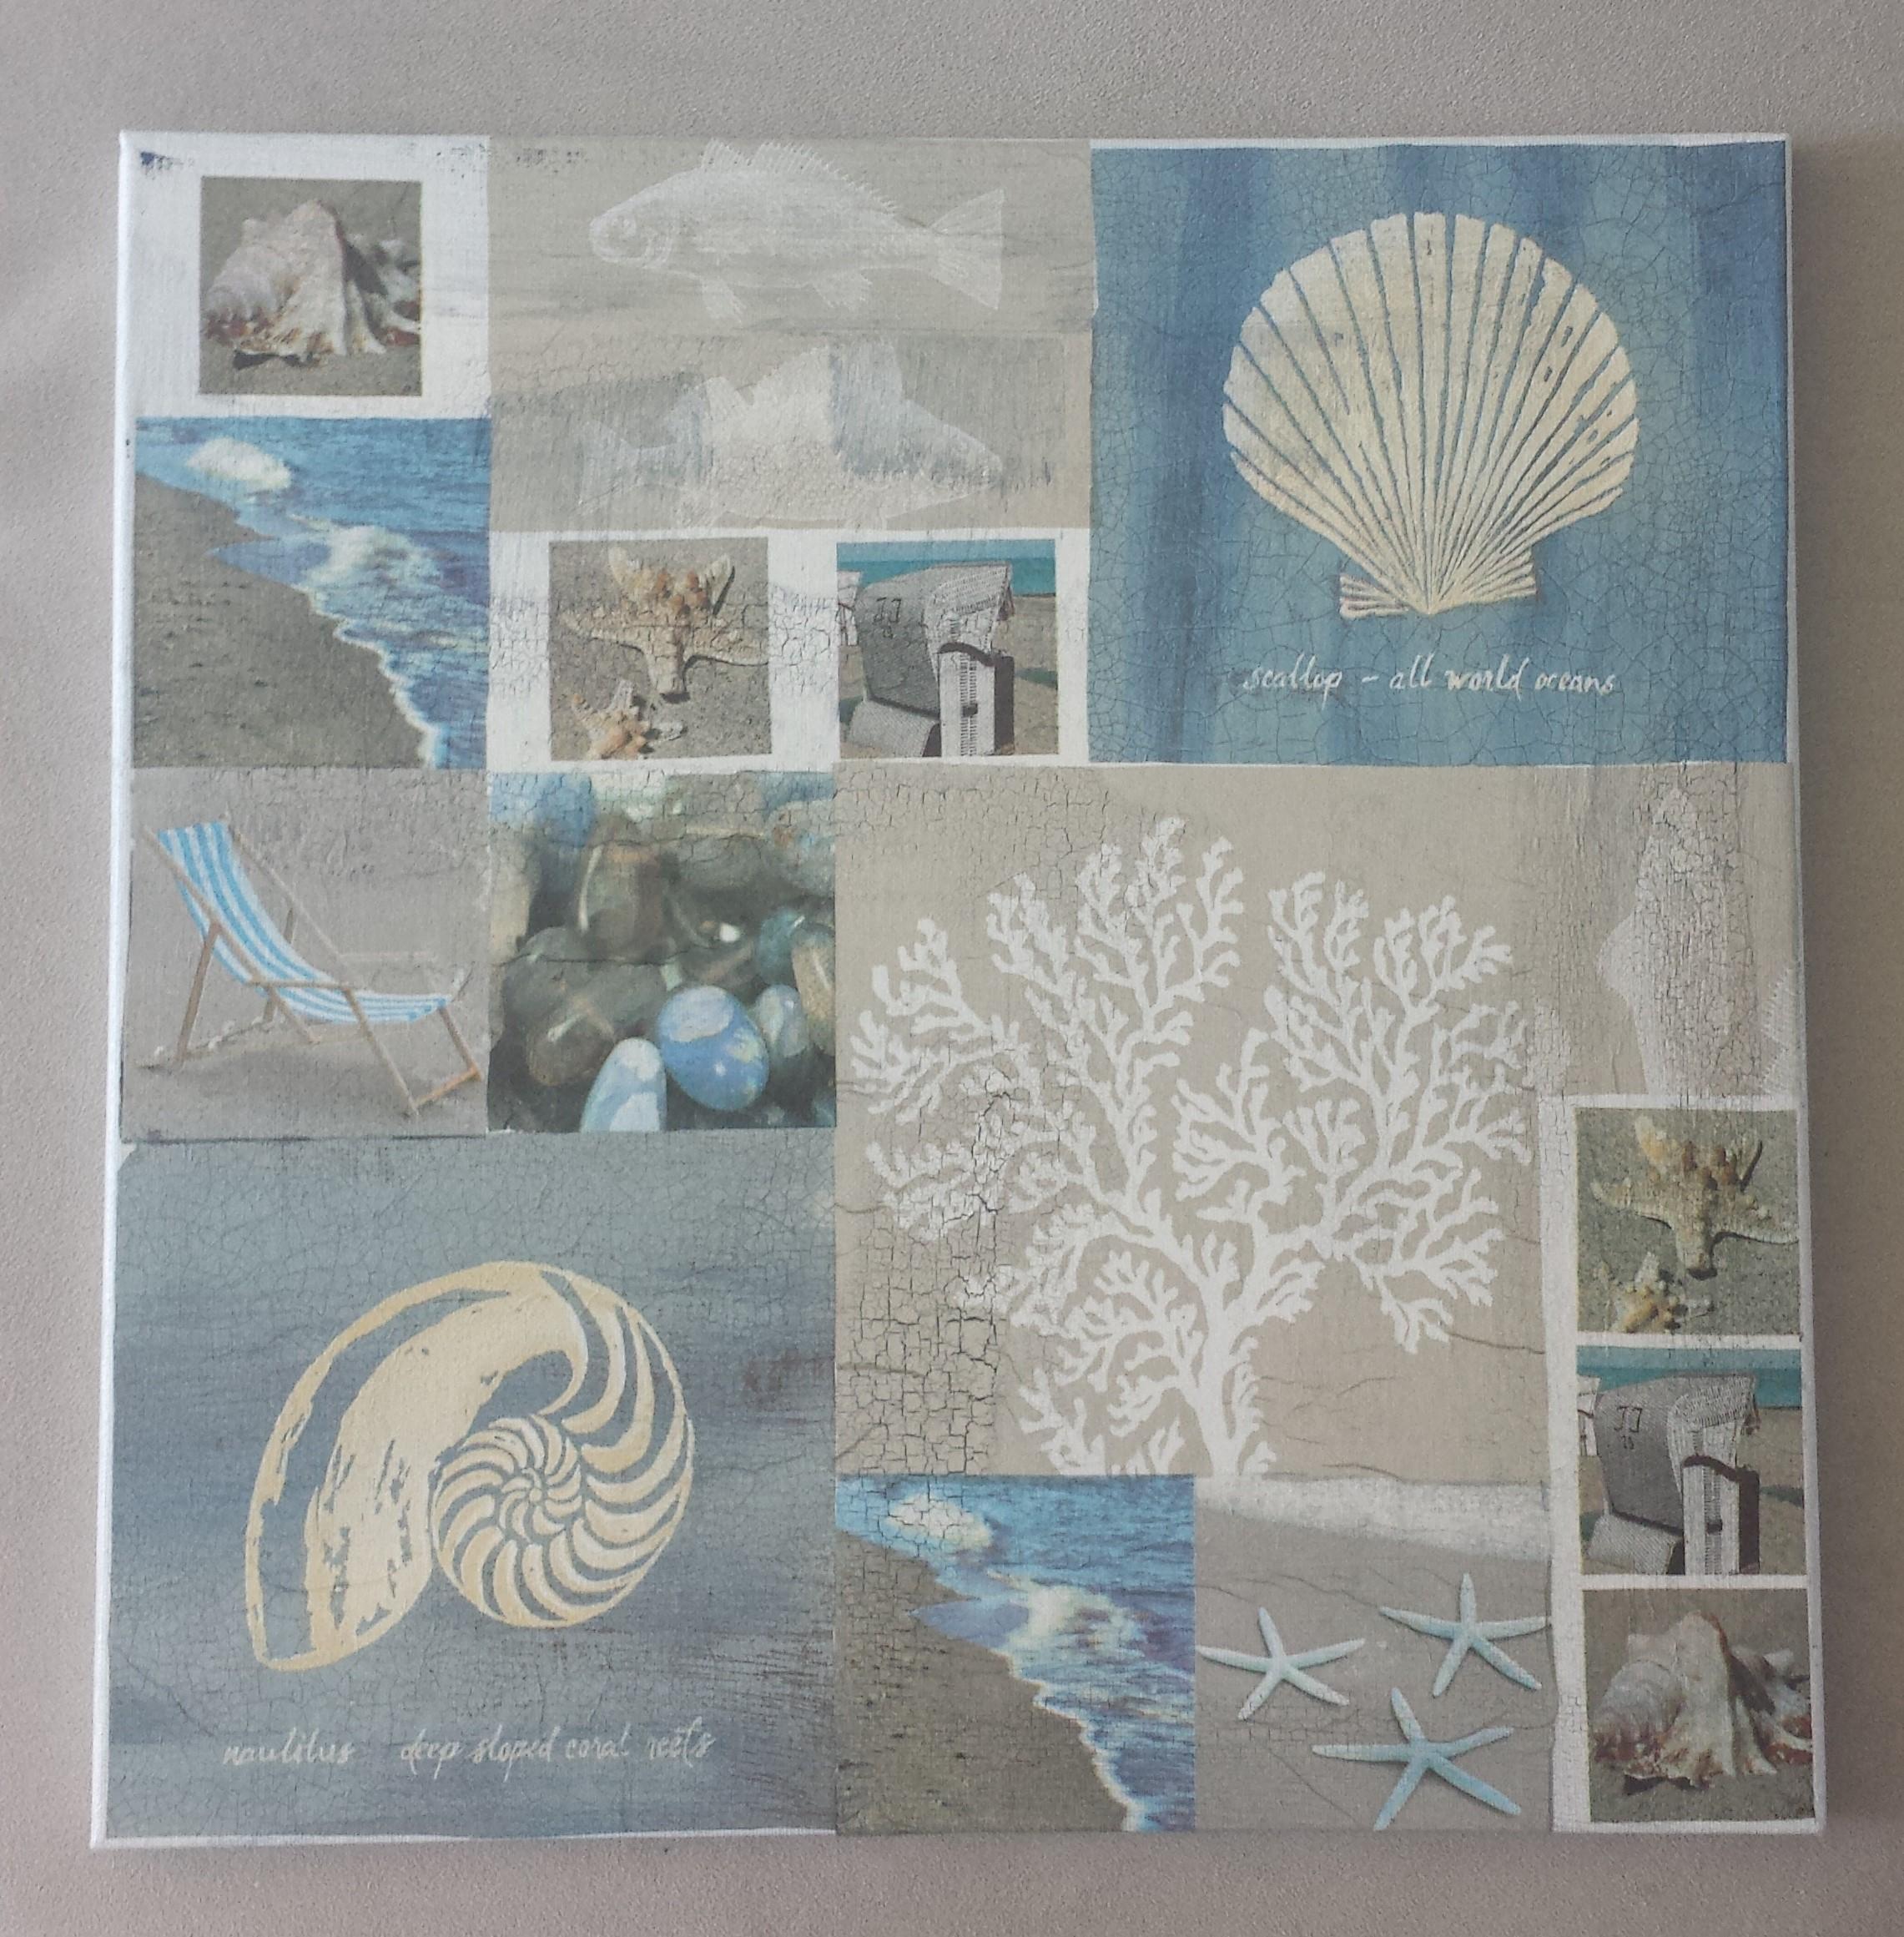 Maritime Bilder 40 cm x 40 cm